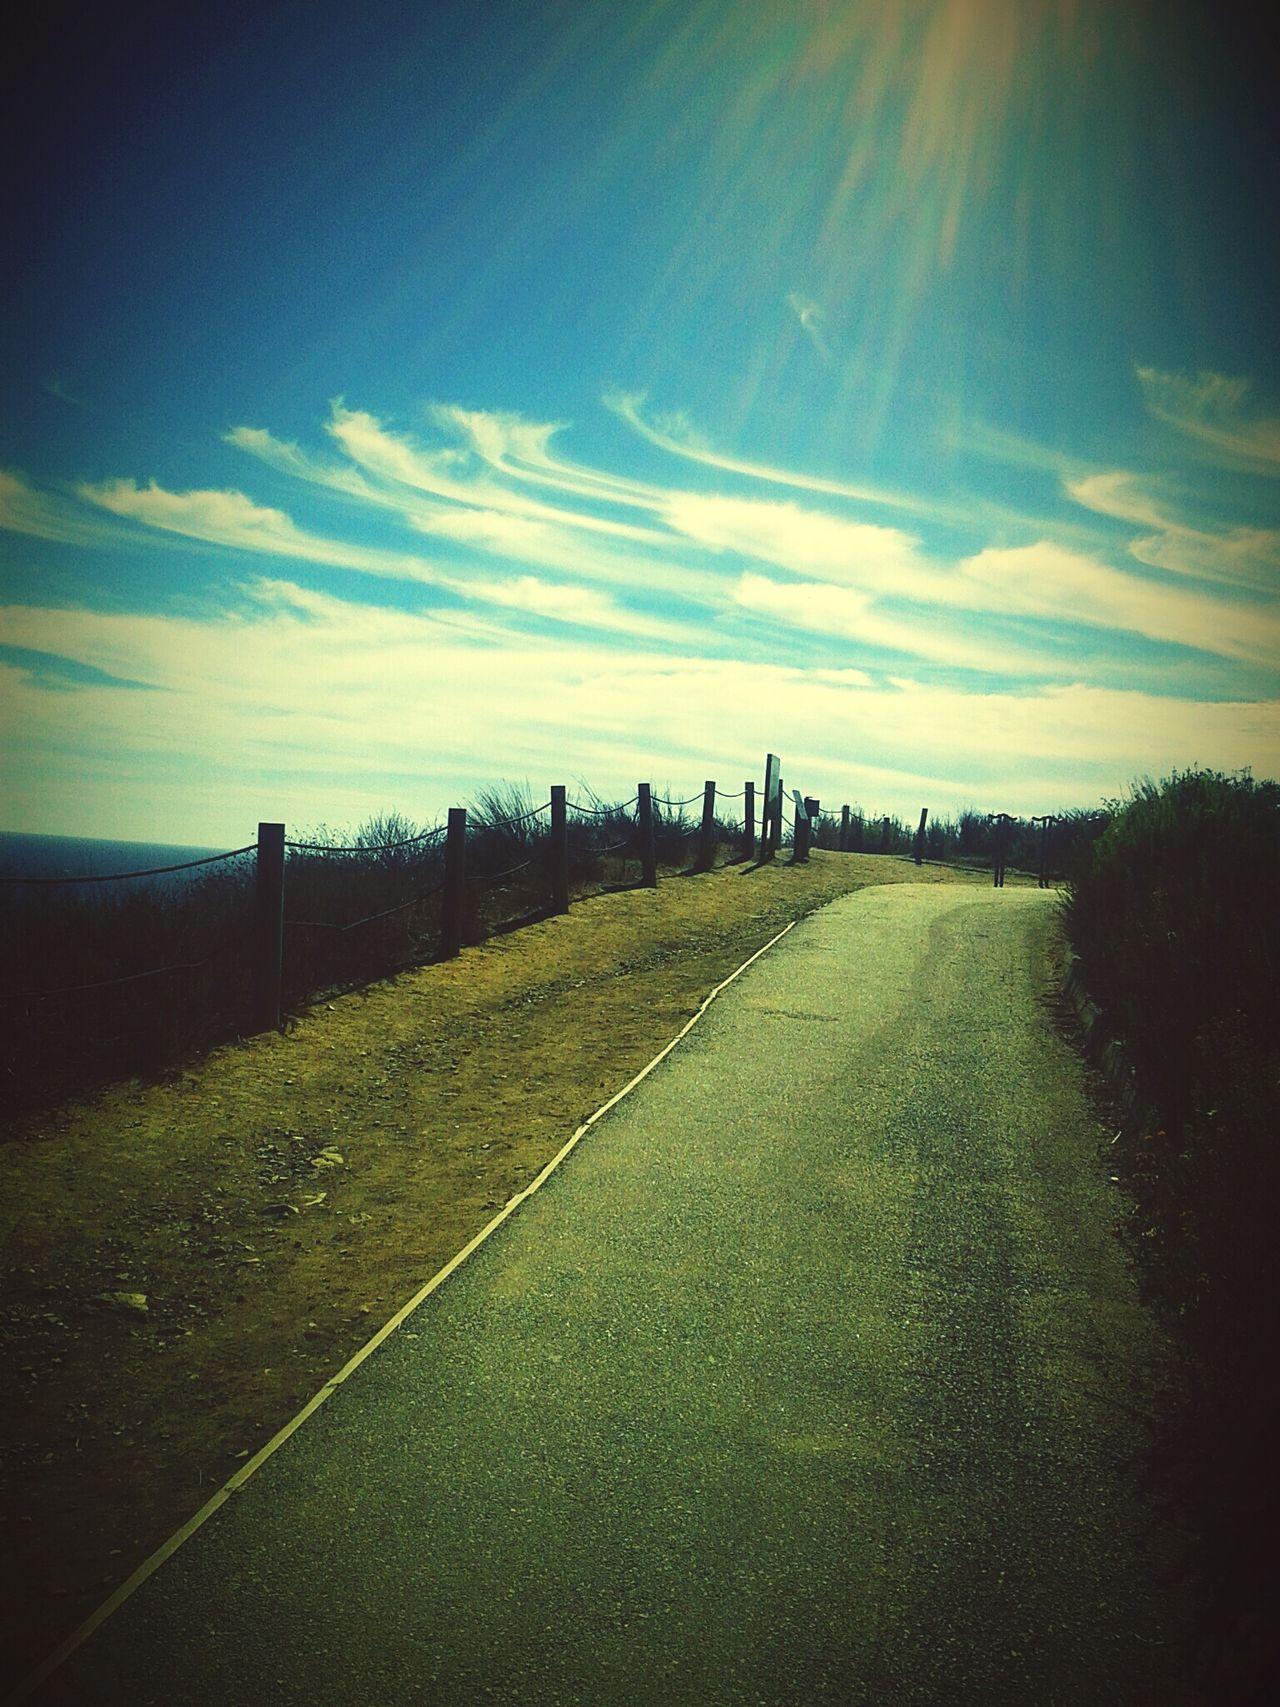 Taking a stroll through the trails by Terranea resort Socal!Feel The Journey First Eyeem Photo